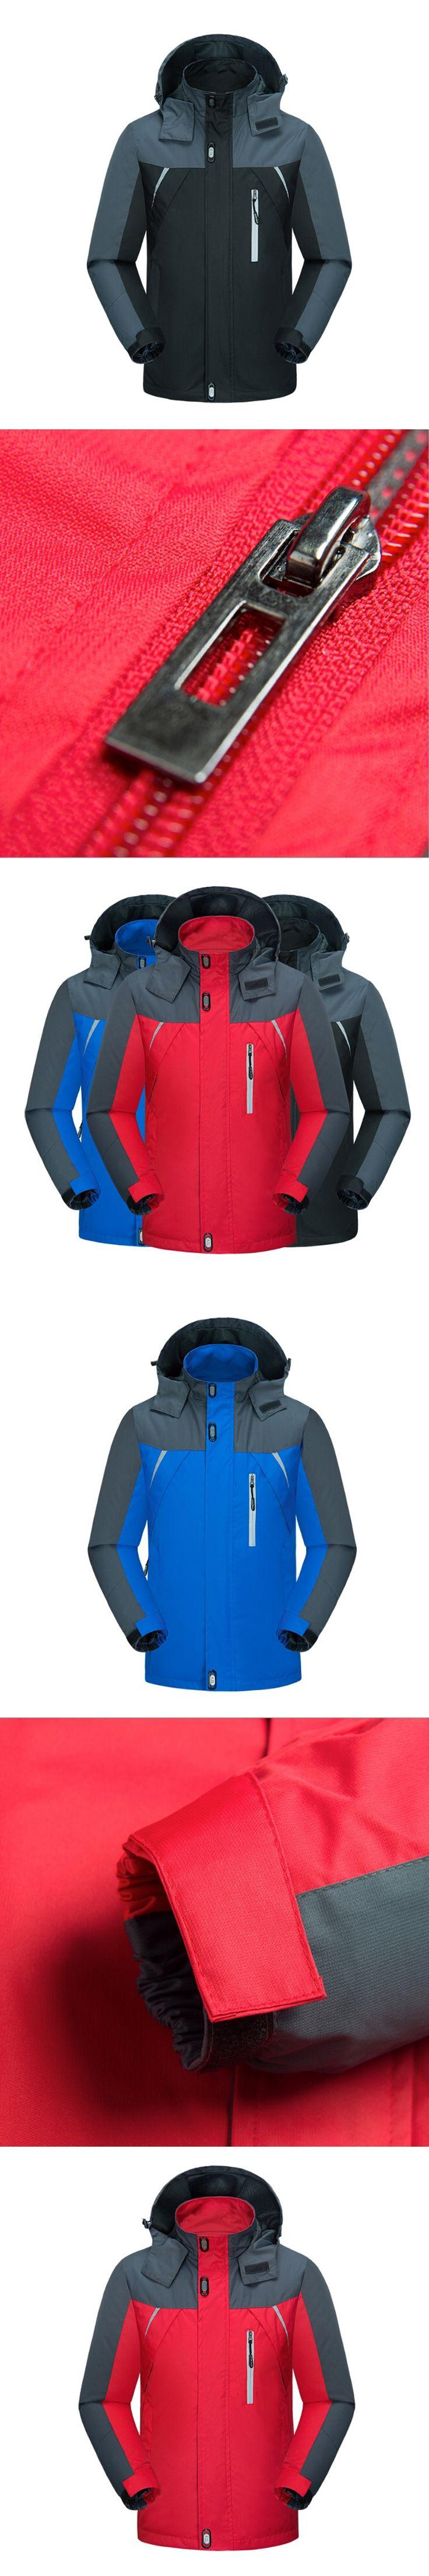 2017  spring&autumn Mountaineering Jackets Men's Windproof Waterproof Jackets Cotton Jackets jaqueta masculino plus size 4XL